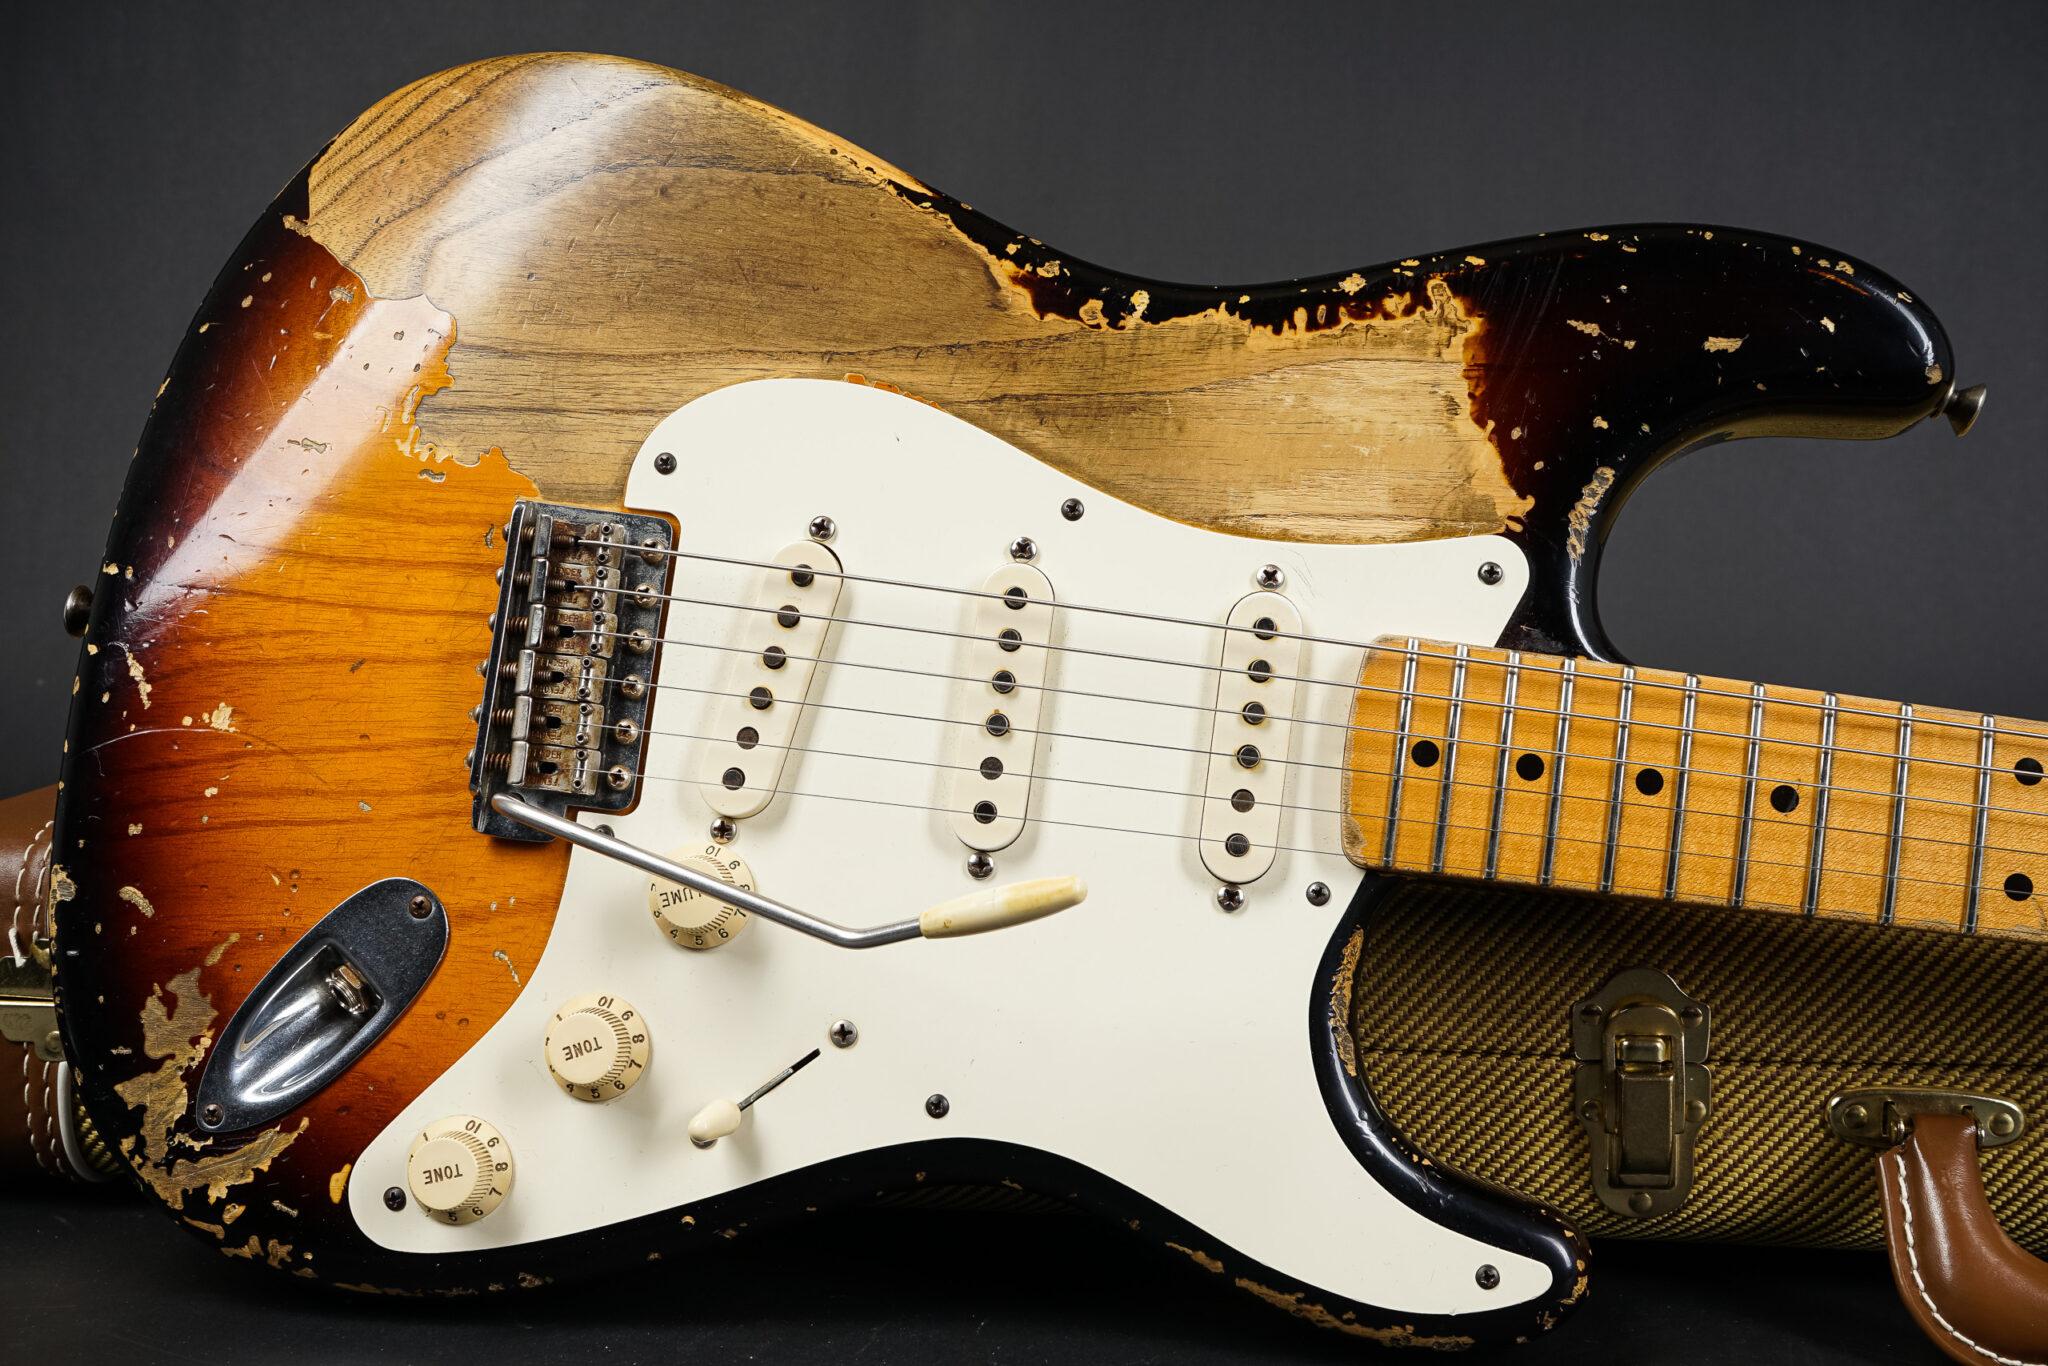 https://guitarpoint.de/app/uploads/products/2009-fender-john-cruz-masterbuilt-1956-stratocaster-heavy-relic-sunburst/2009-Fender-John-Cruz-Masterbuilt-1956-Stratocaster-JC1327-9-2048x1366.jpg